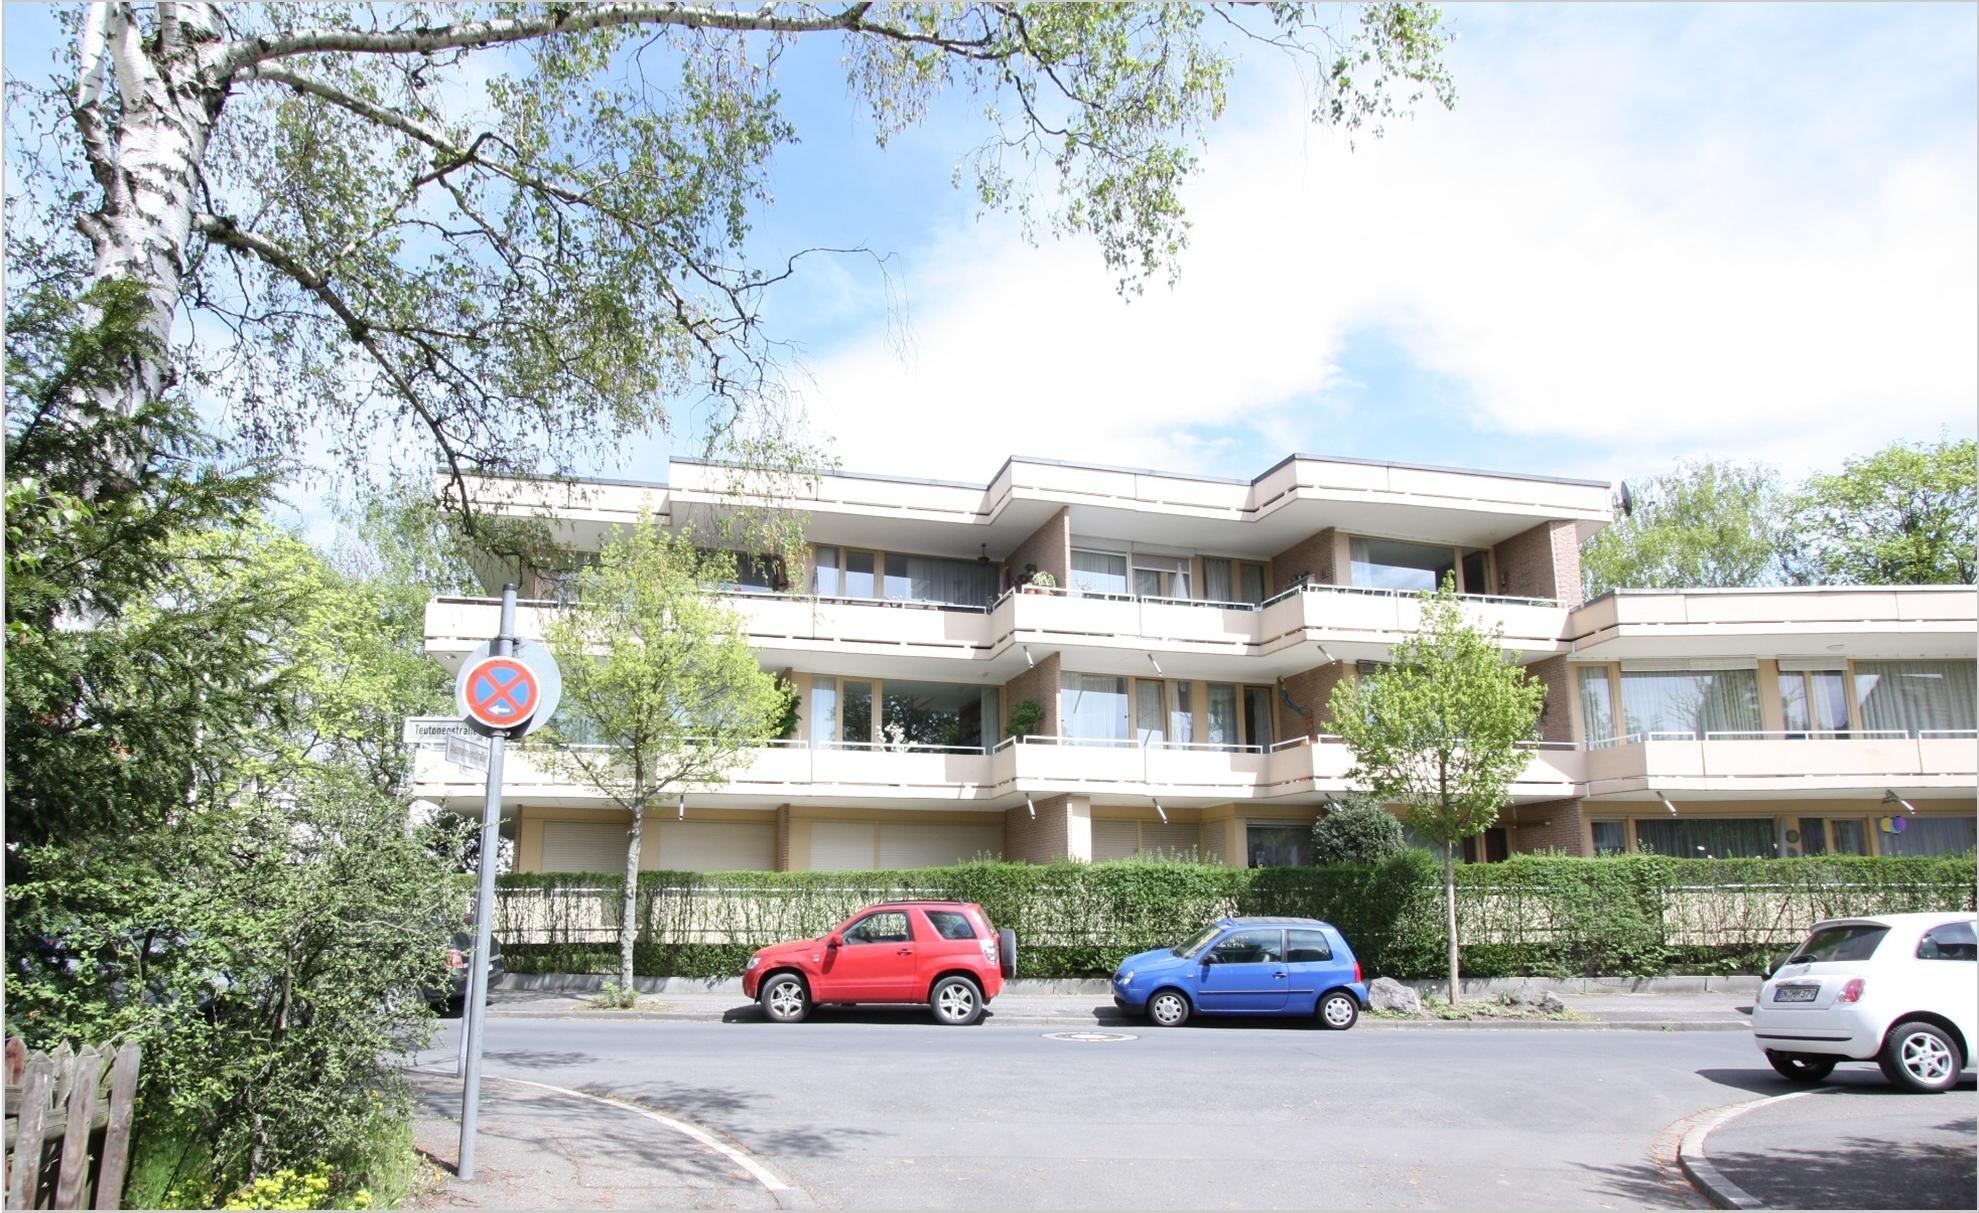 Eigentumswohnung In Bad Godesberg